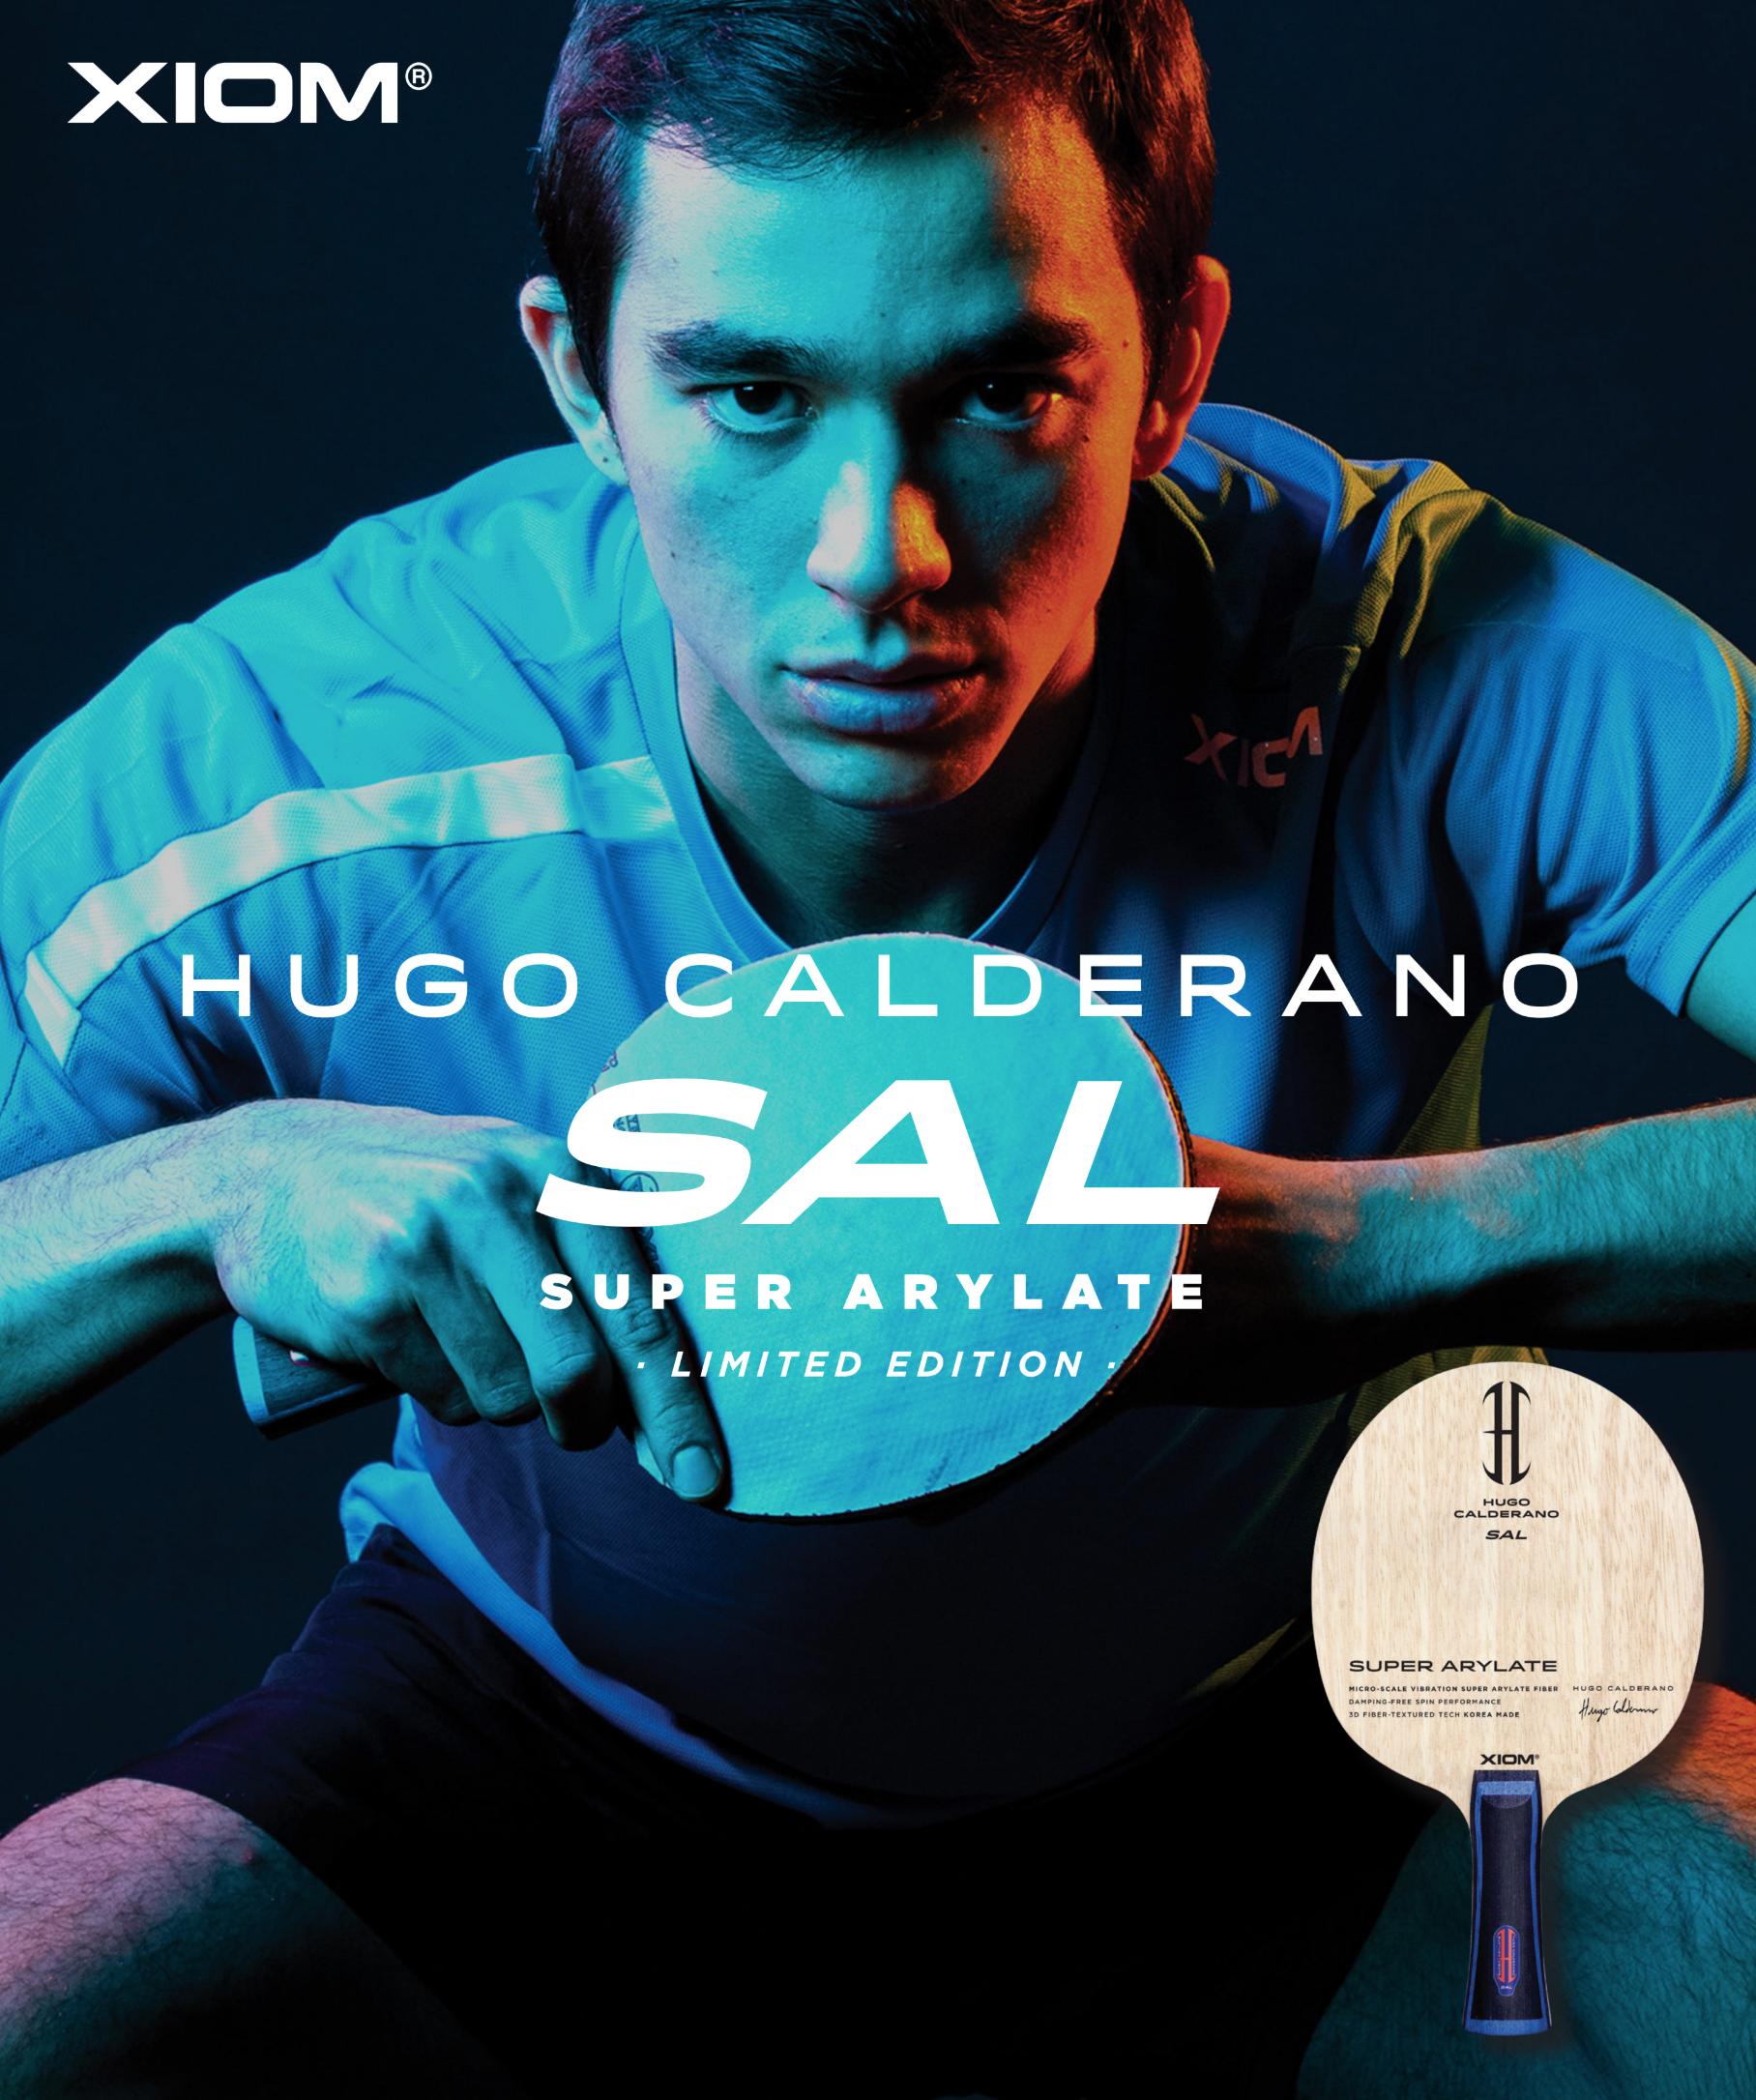 HugoCalderanoSAL